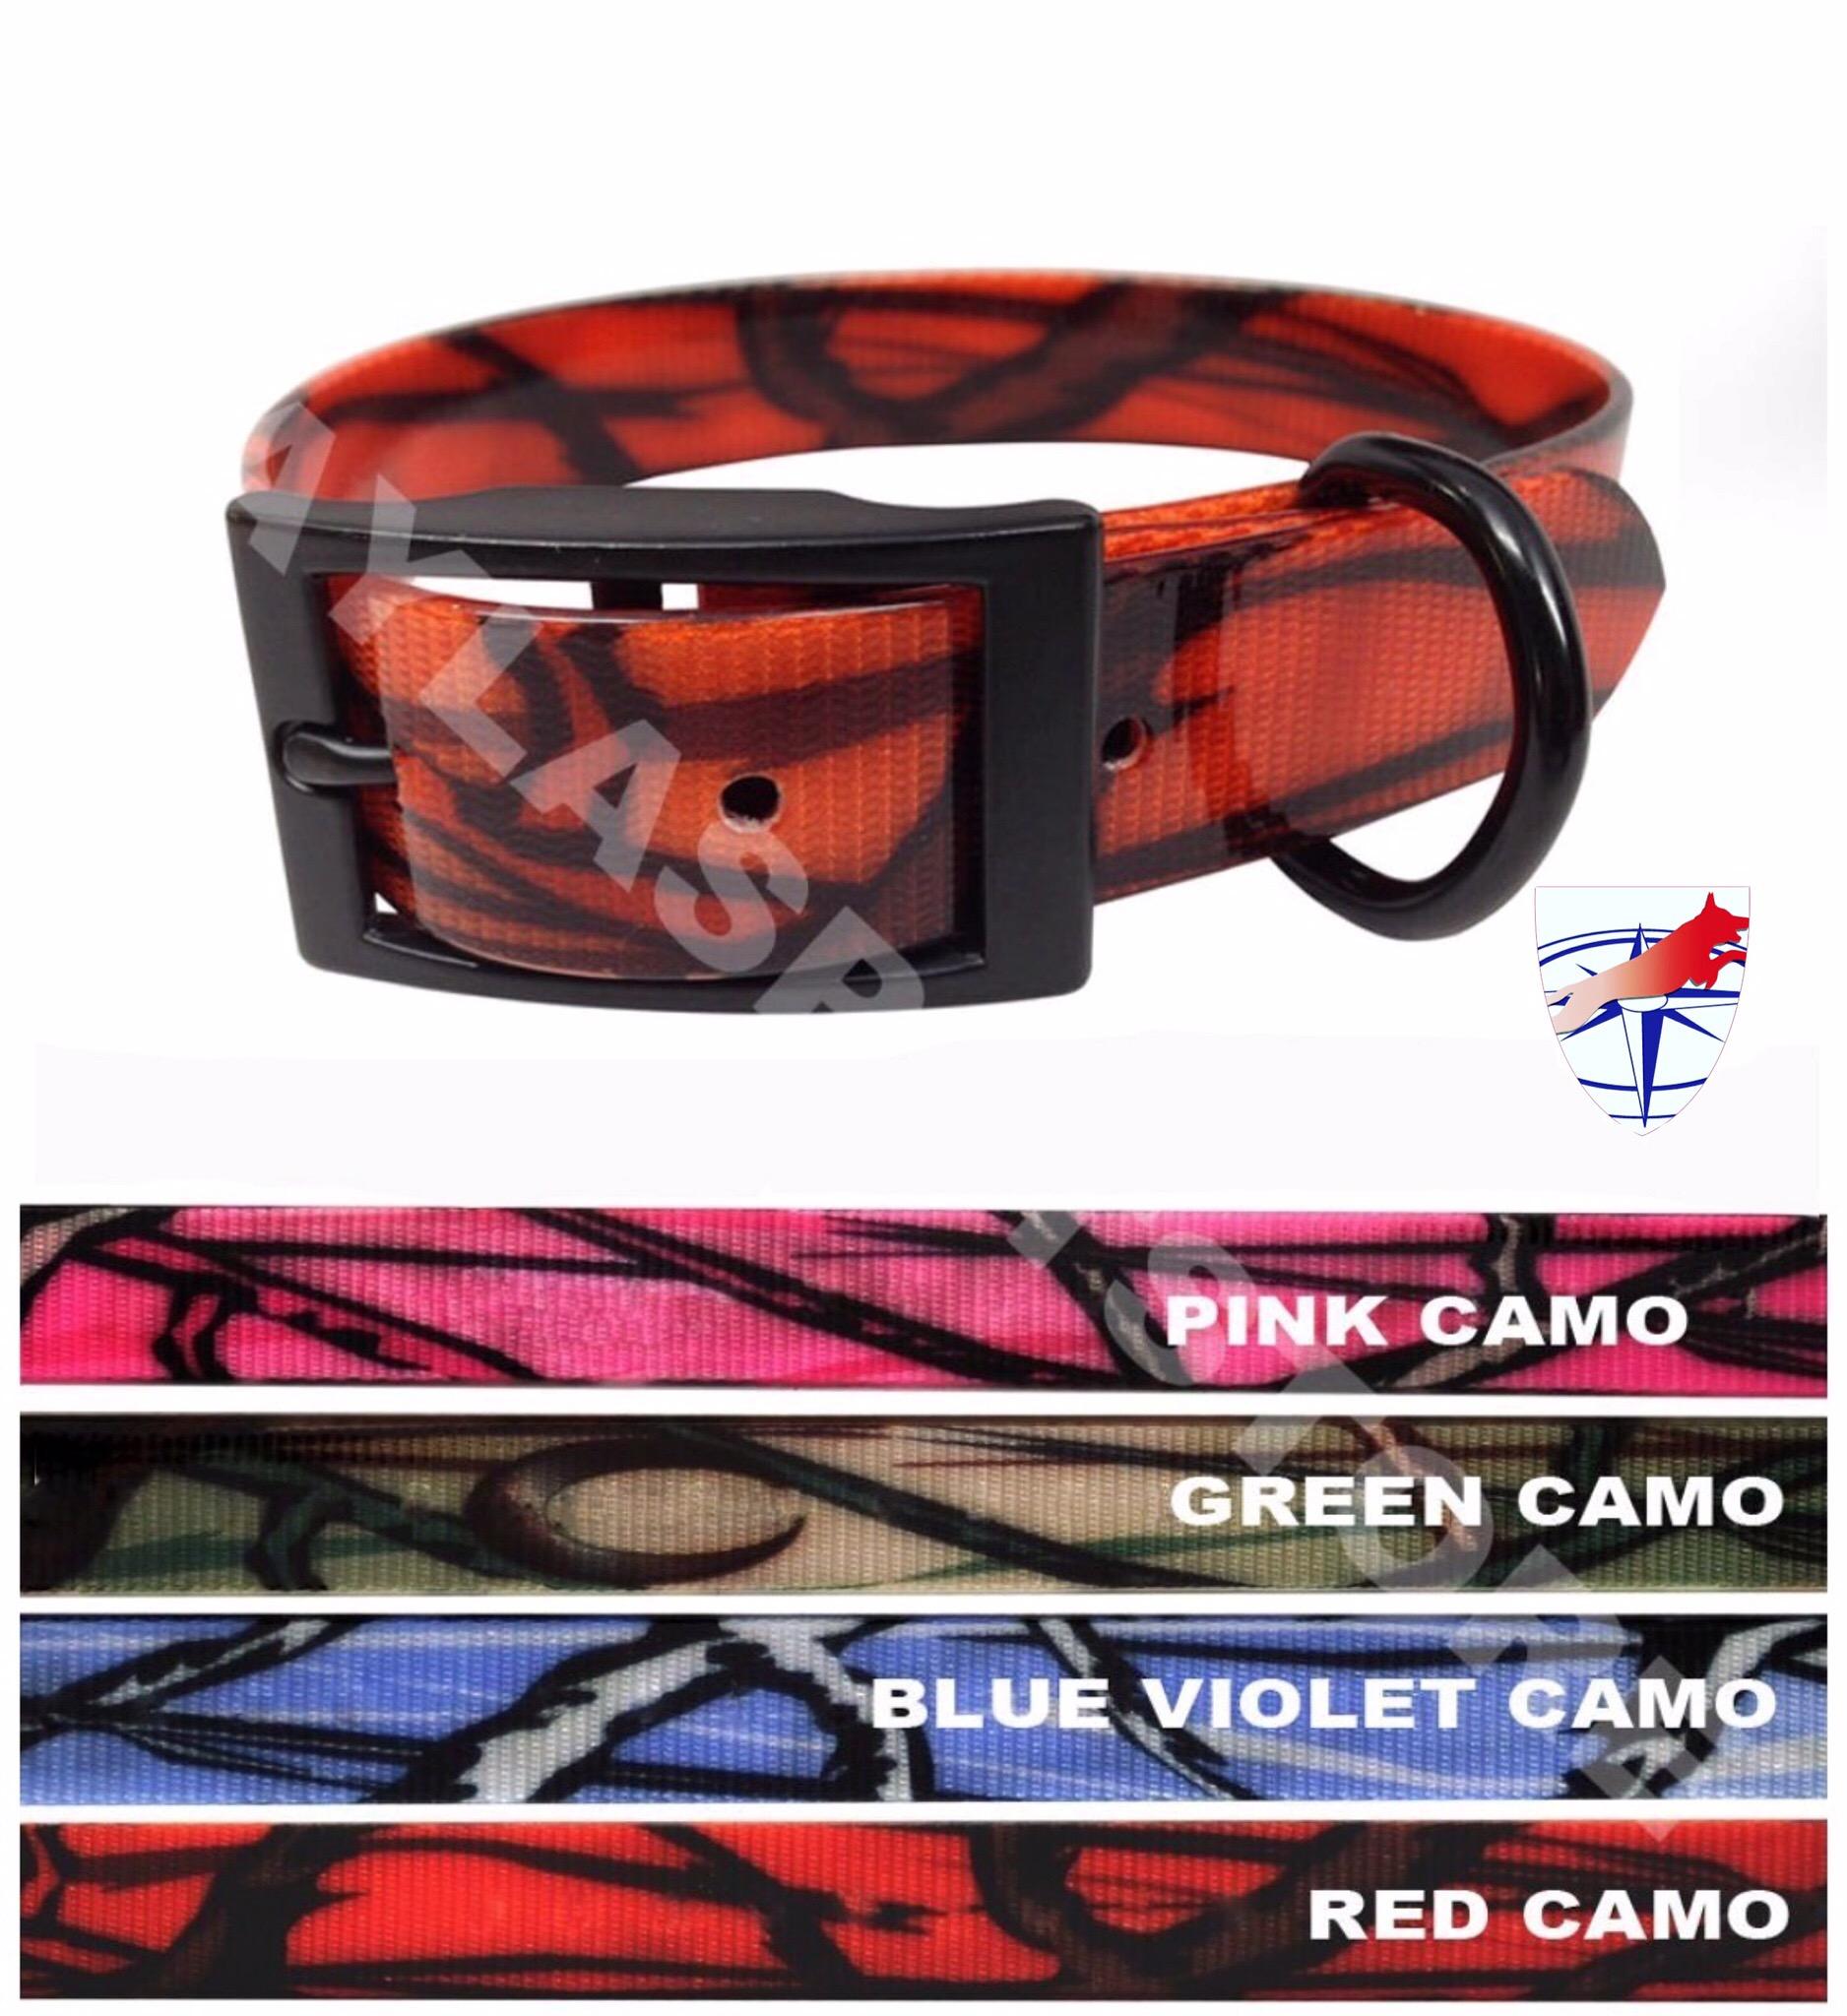 MAK9 Camo Collars